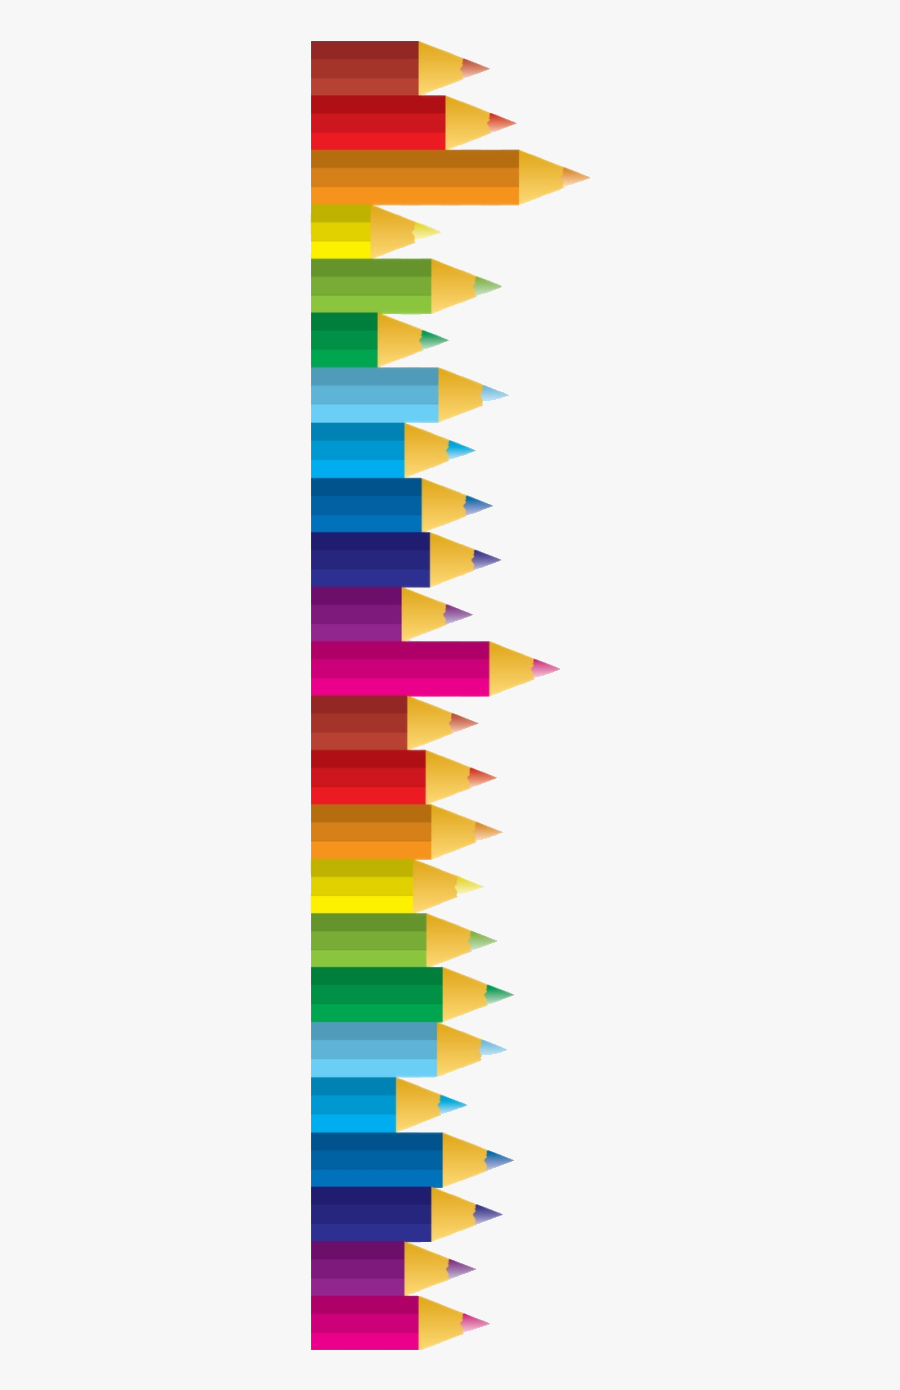 Pencil Colored Pencils Clipart Transparent Images Free - Transparent Colored Pencil Border, Transparent Clipart